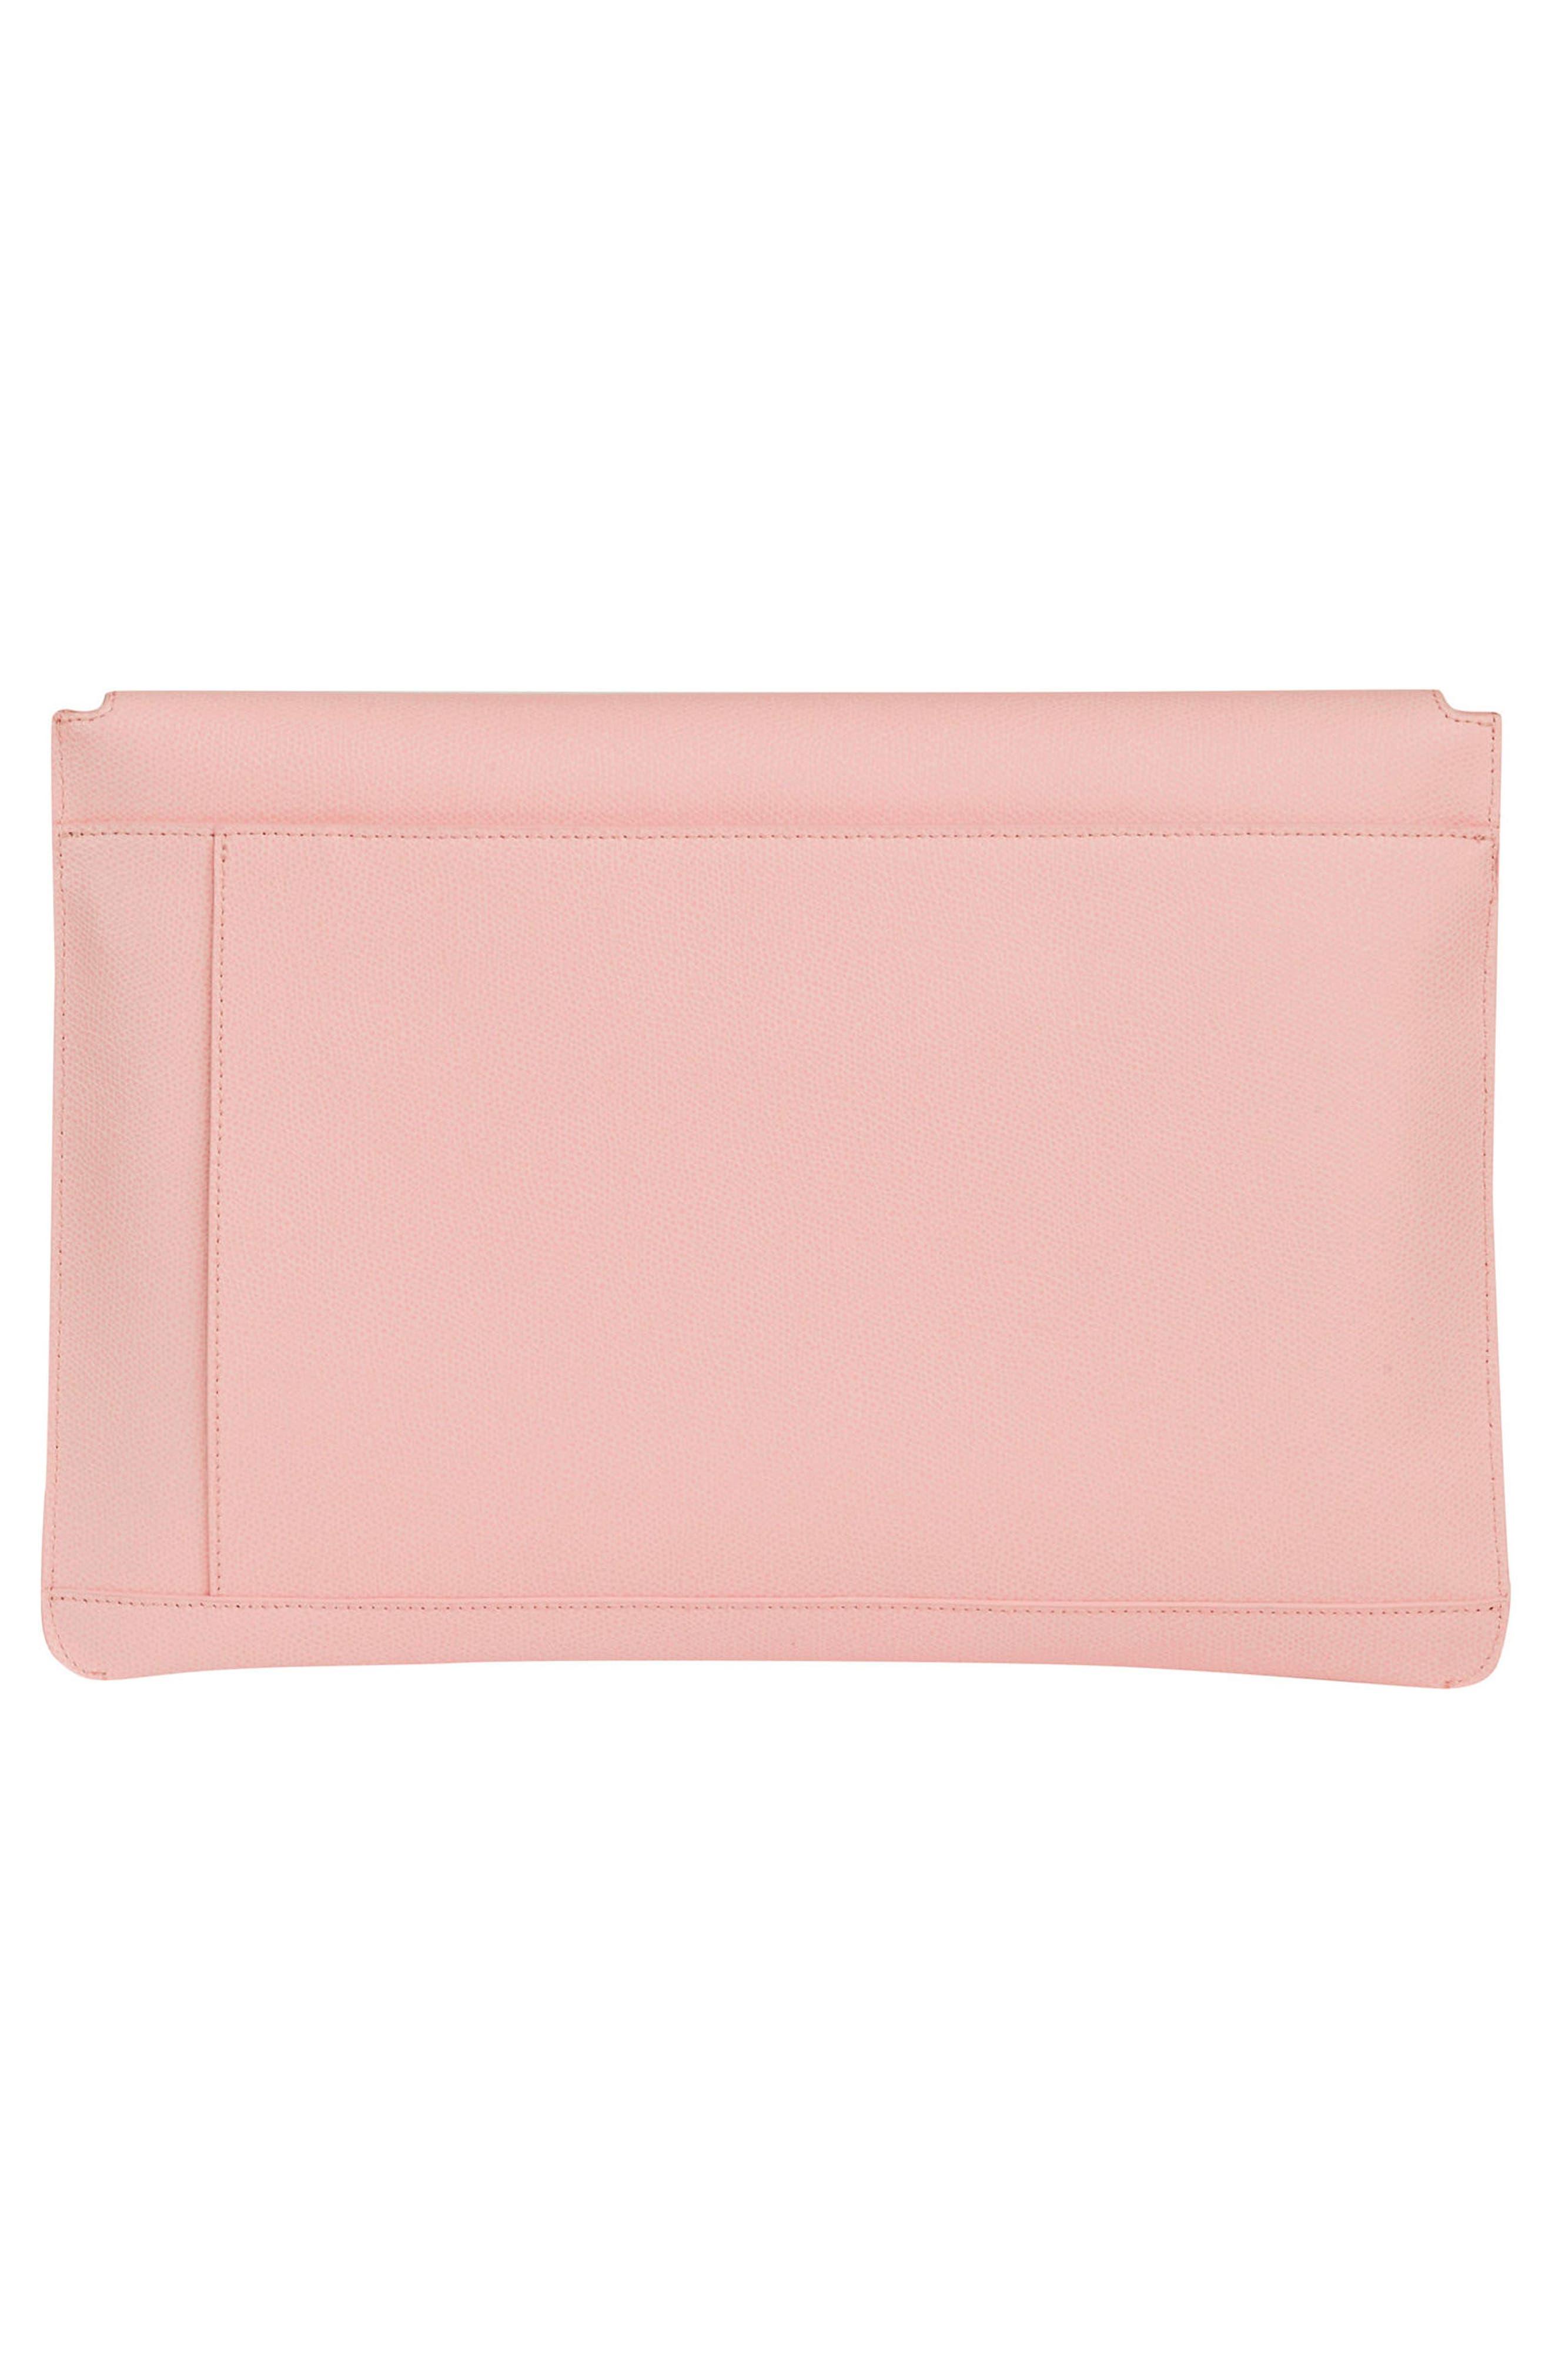 Pebbled Leather Envelope Clutch,                             Alternate thumbnail 2, color,                             Blush